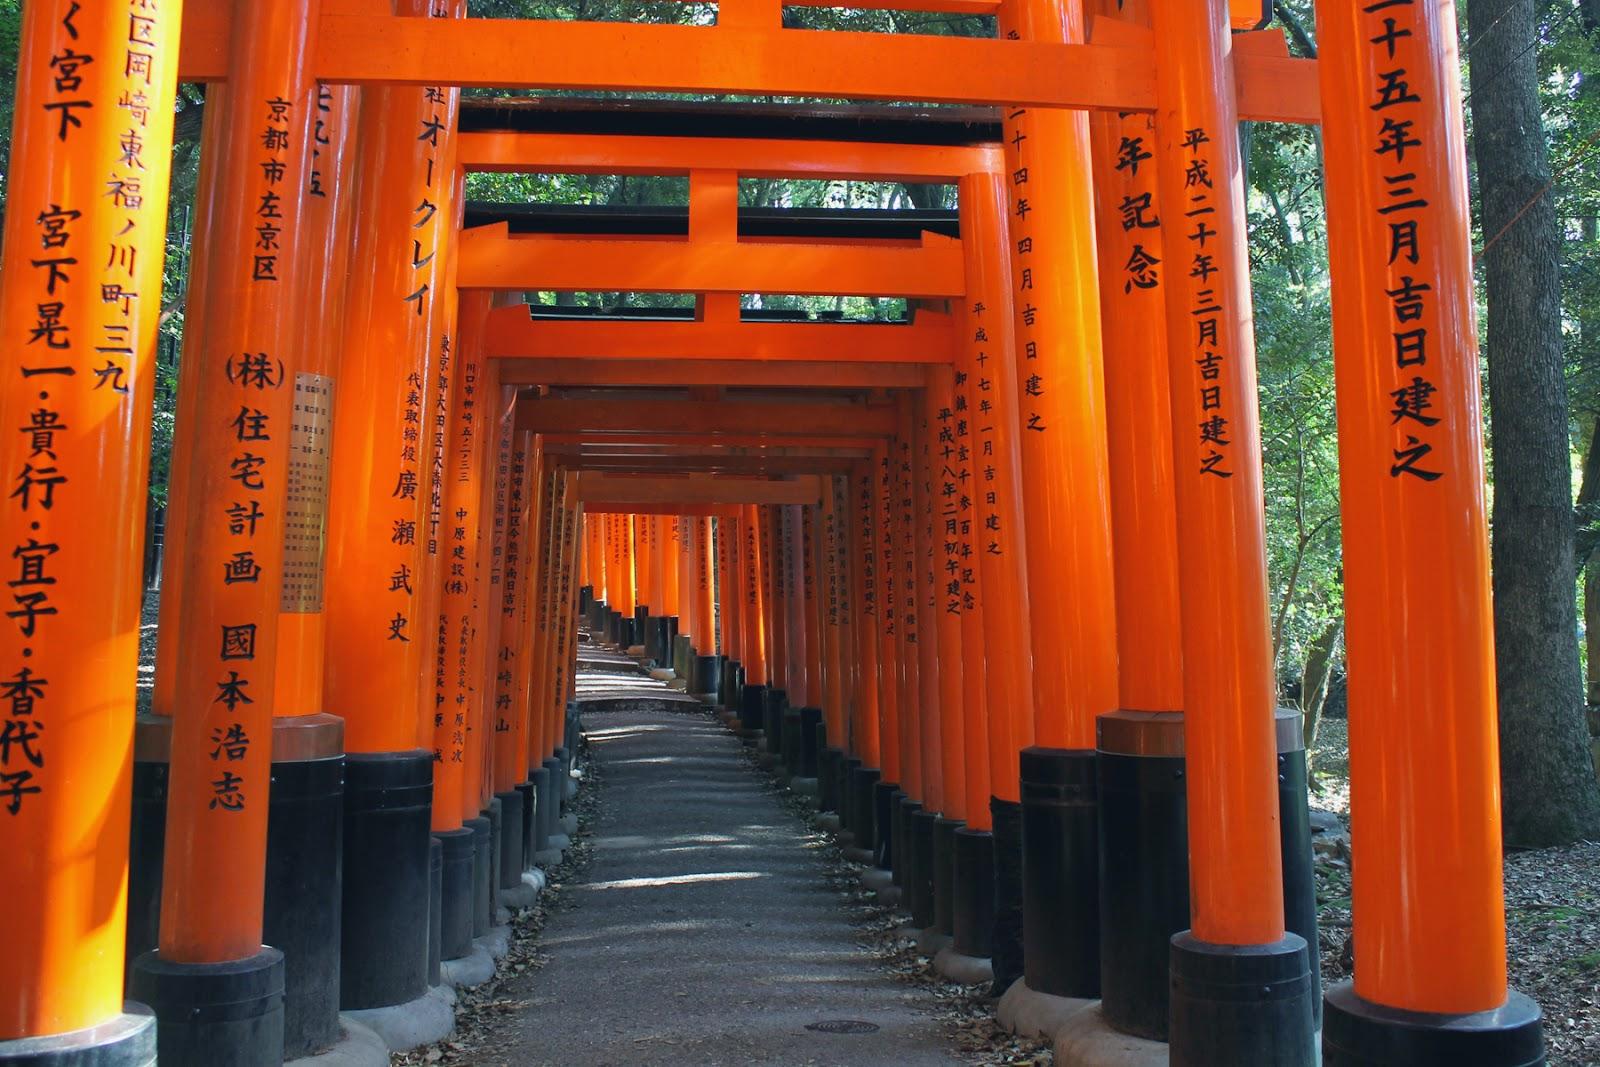 viajar a japon por menos de 3000 euros